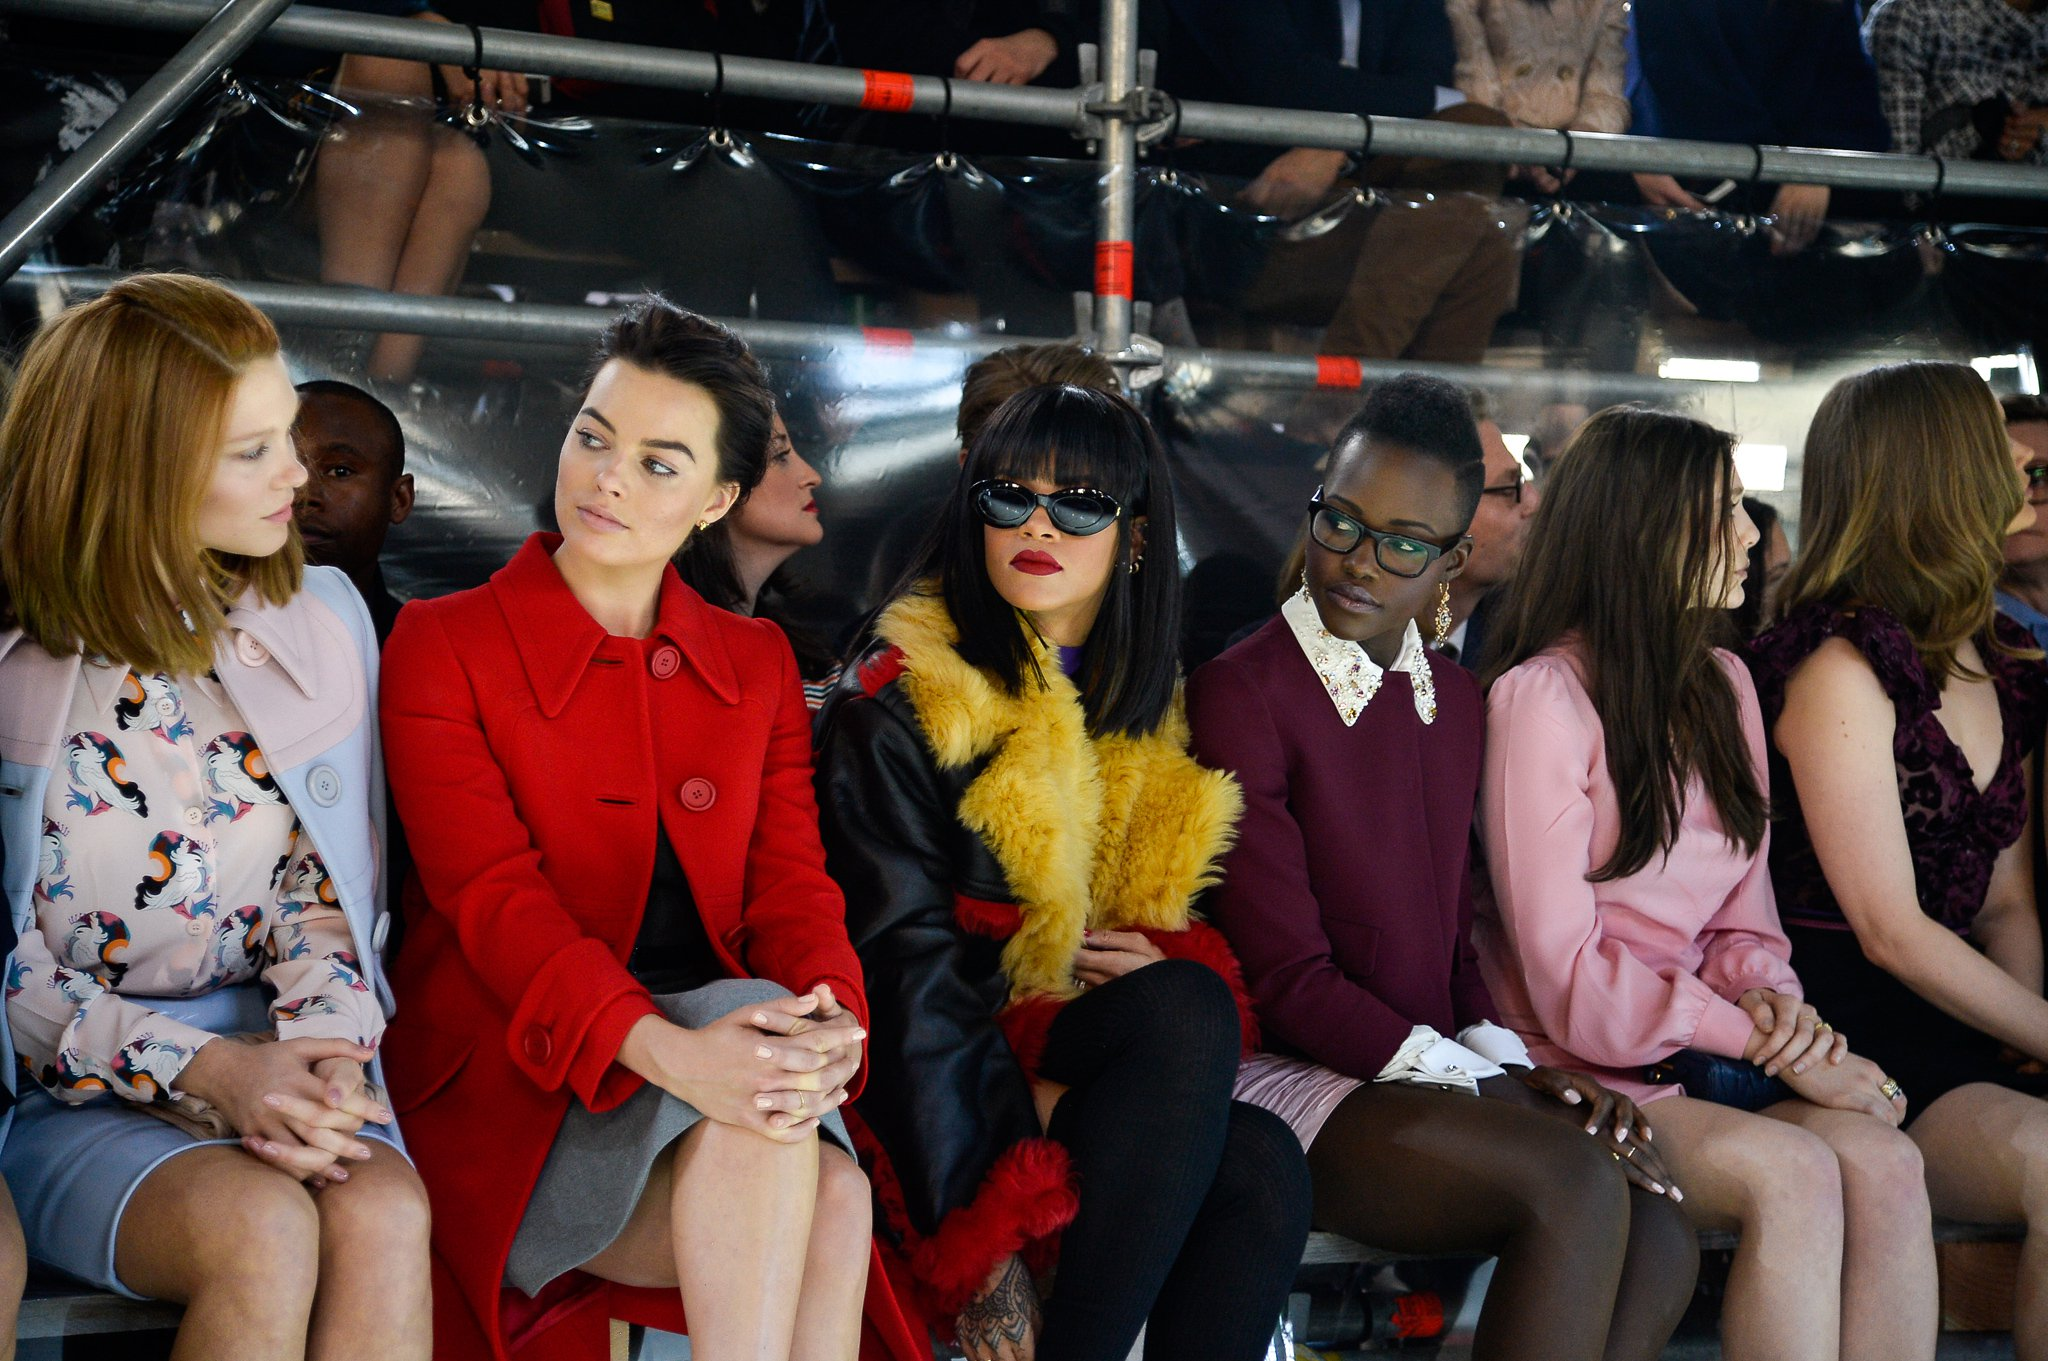 #Instafash: Rihanna